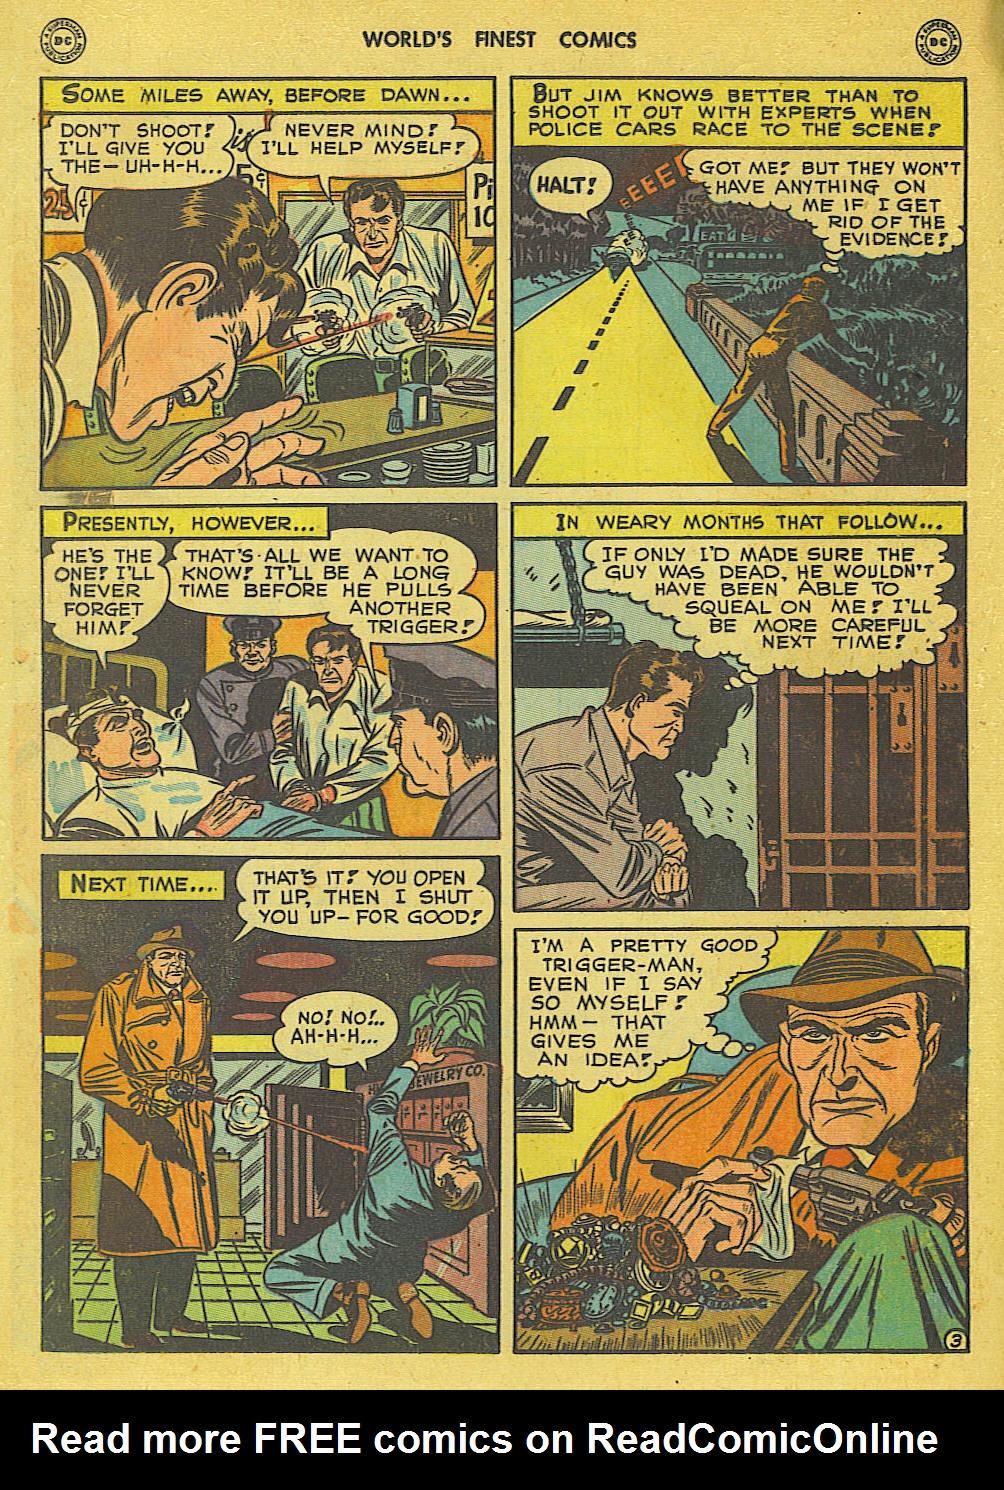 Read online World's Finest Comics comic -  Issue #34 - 64